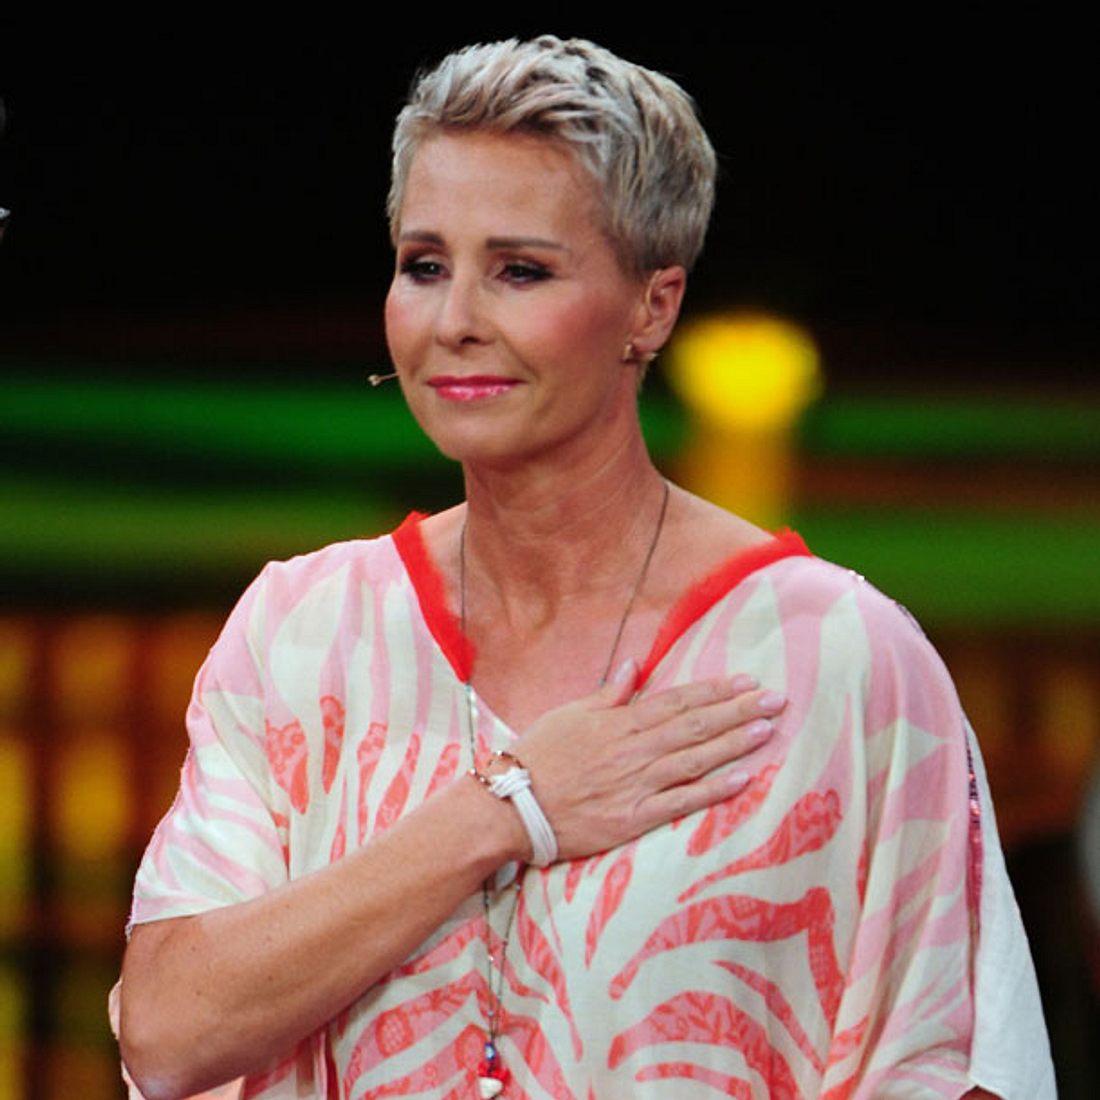 Sonja Zietlow 2015